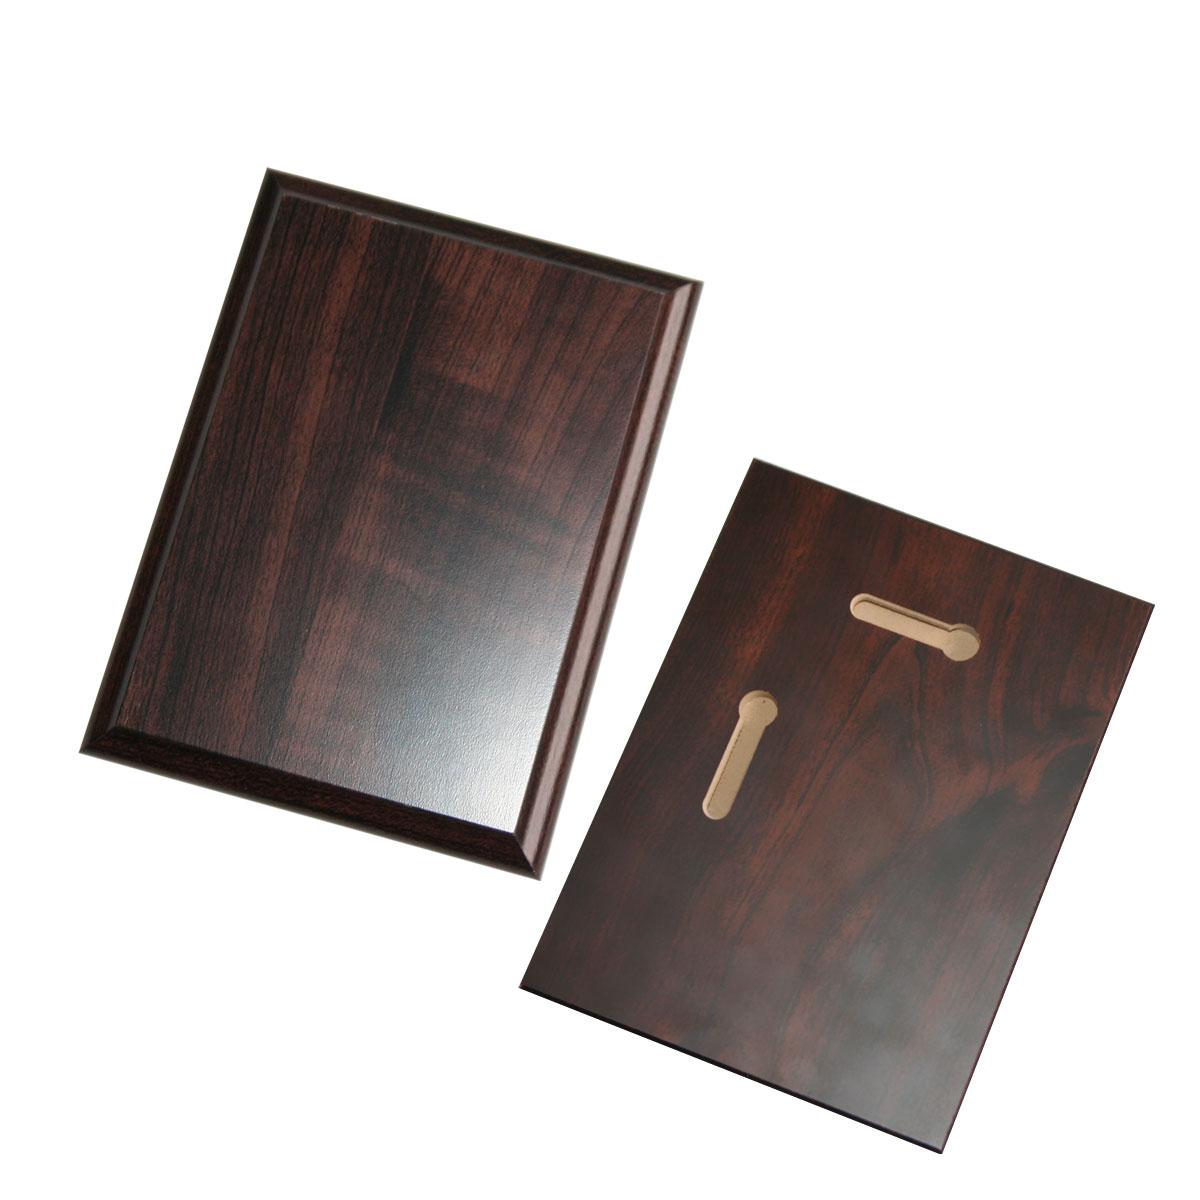 Wood base for metal for sublimation overprint